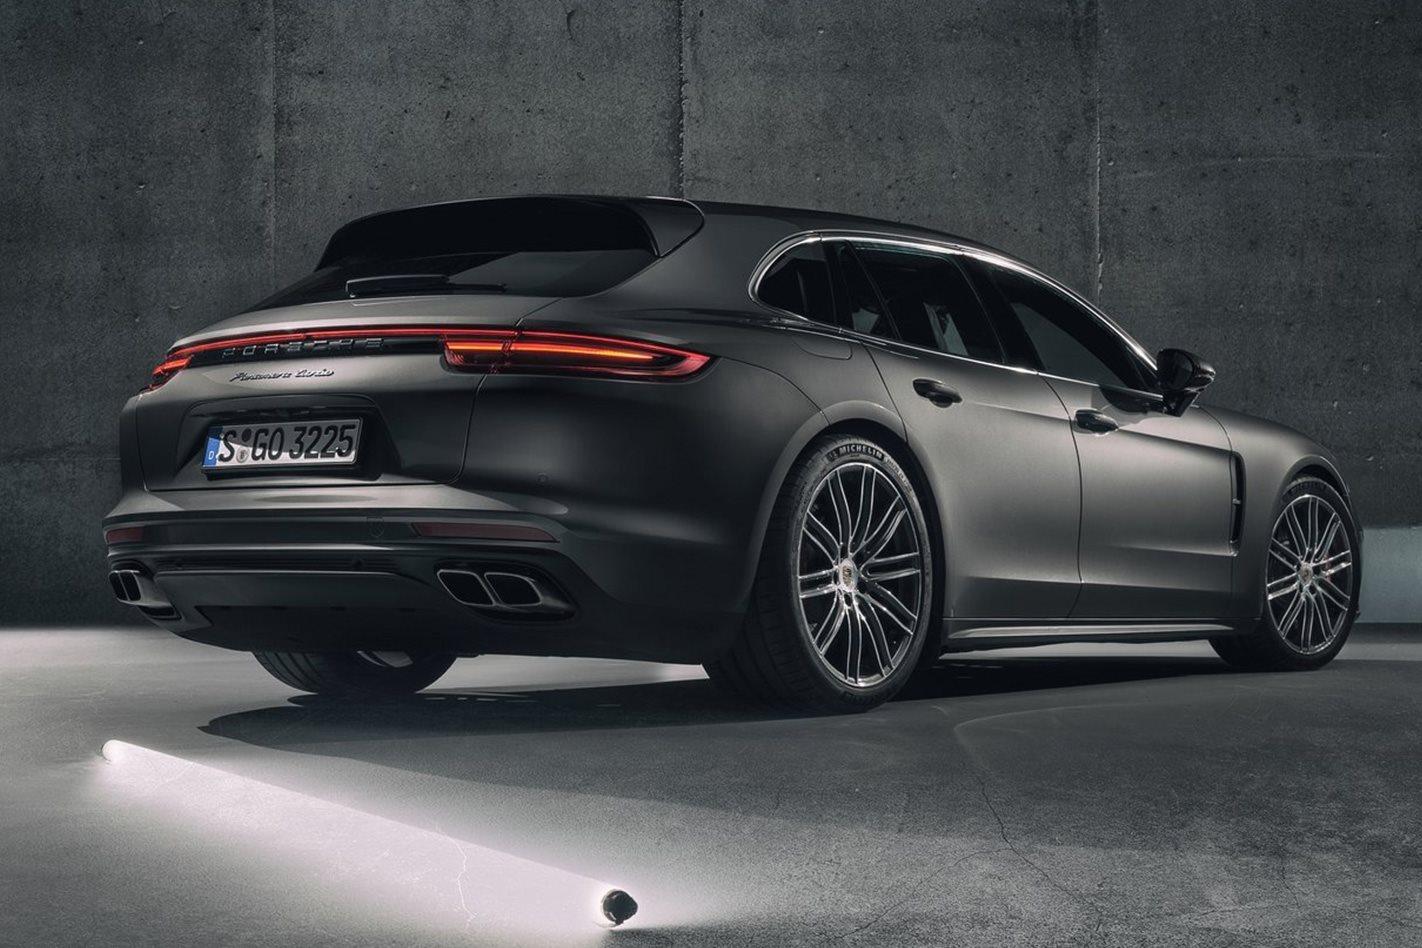 2018-Porsche-Panamera-Sport-Turismo.jpg